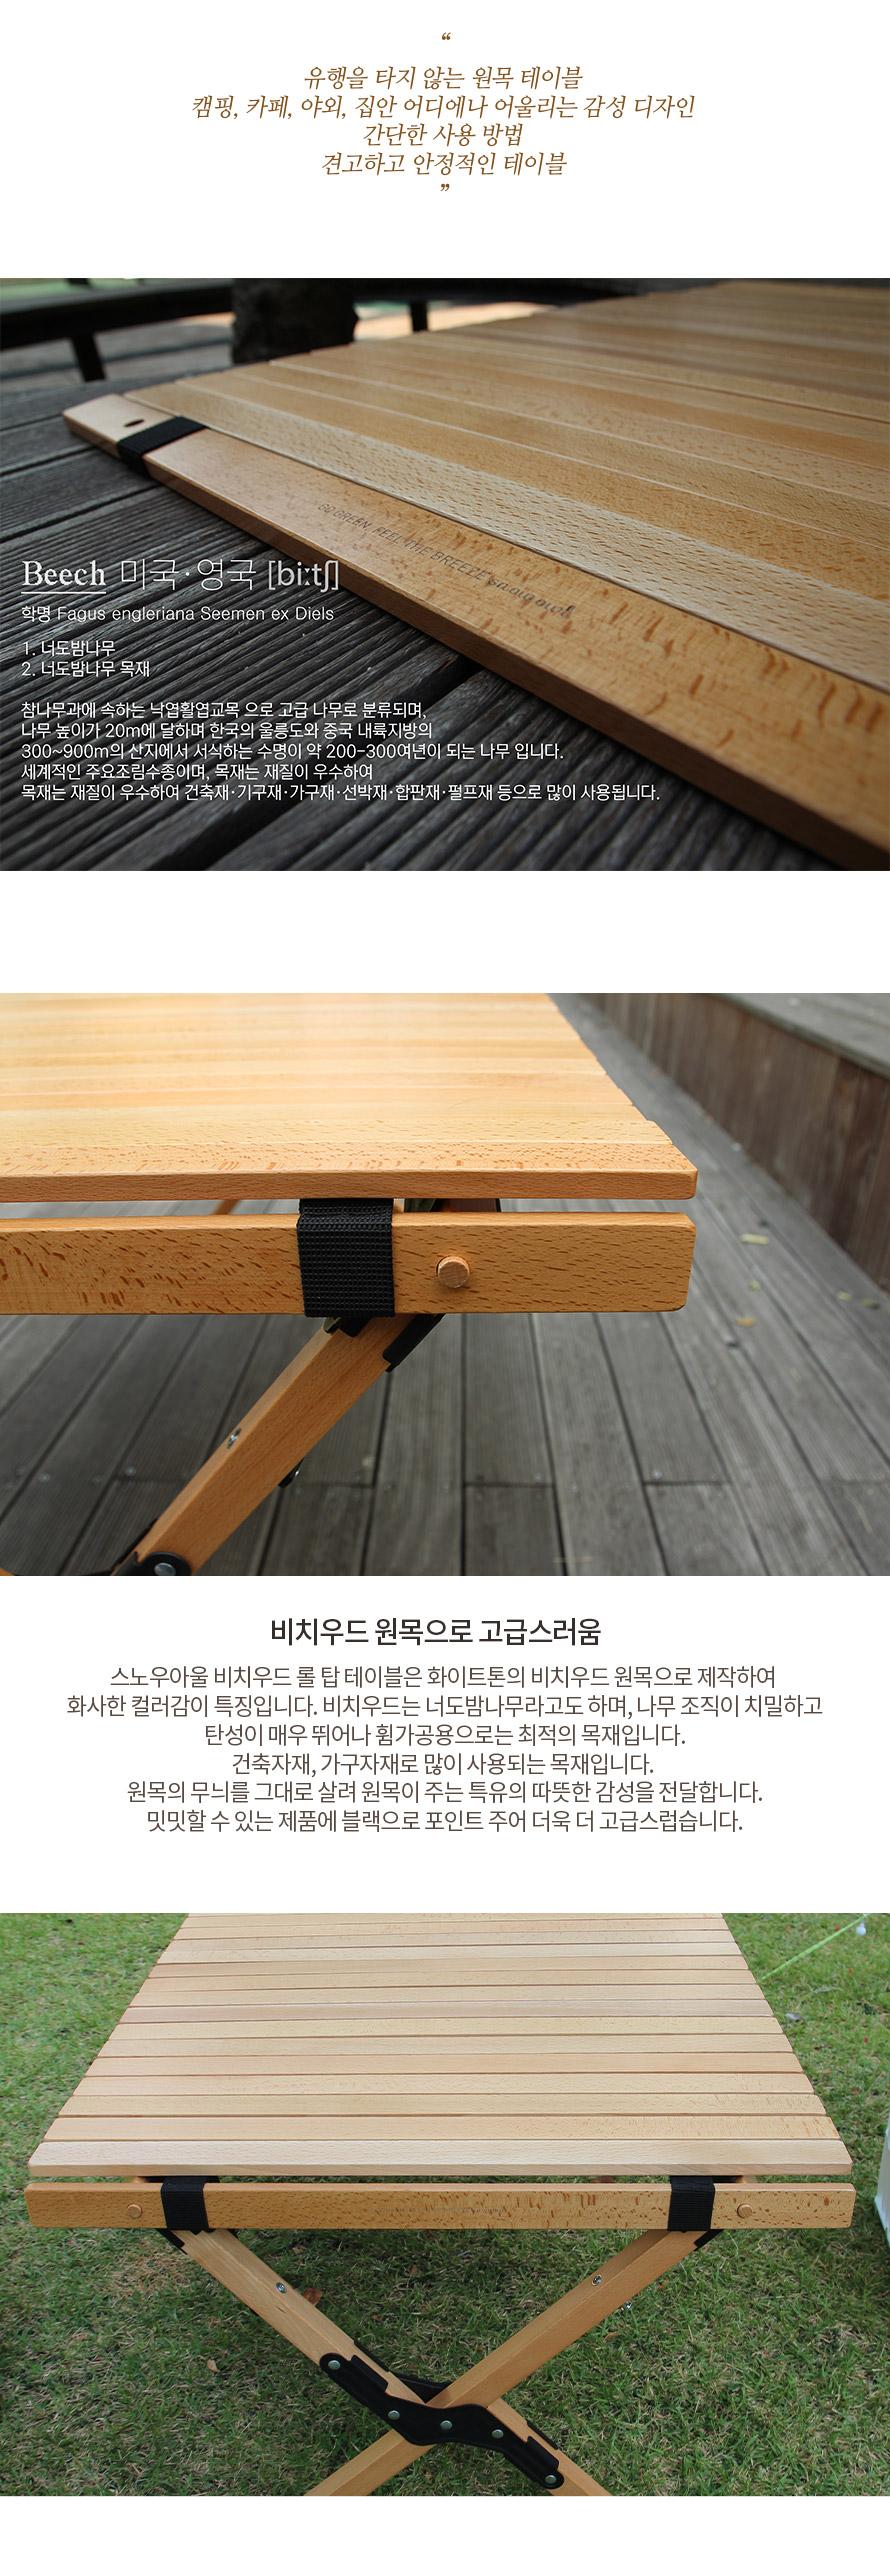 beechwood_roll_top_table_03.jpg